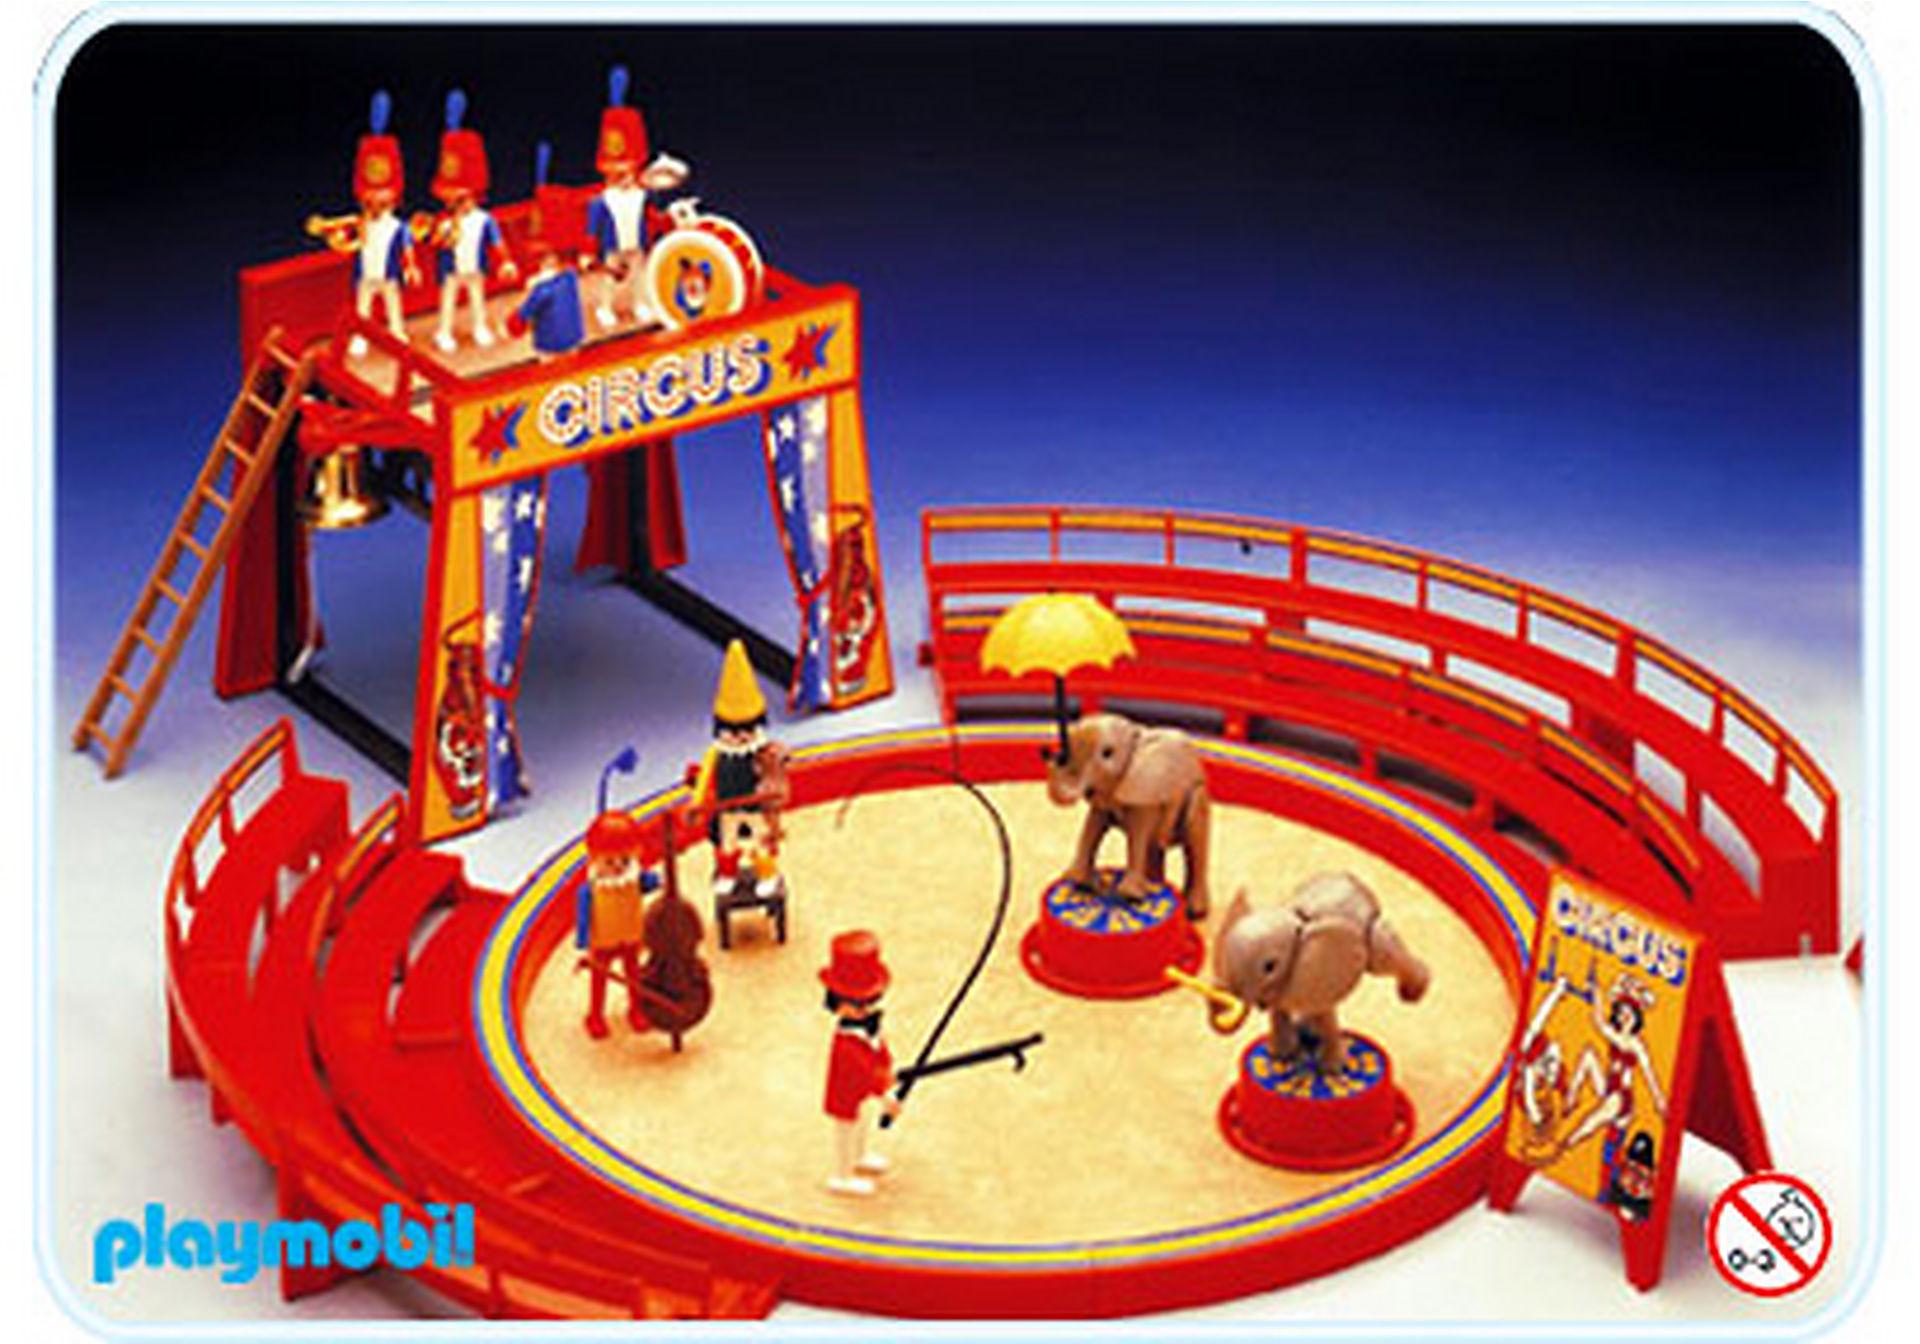 3553-A Zirkus-Manege zoom image1